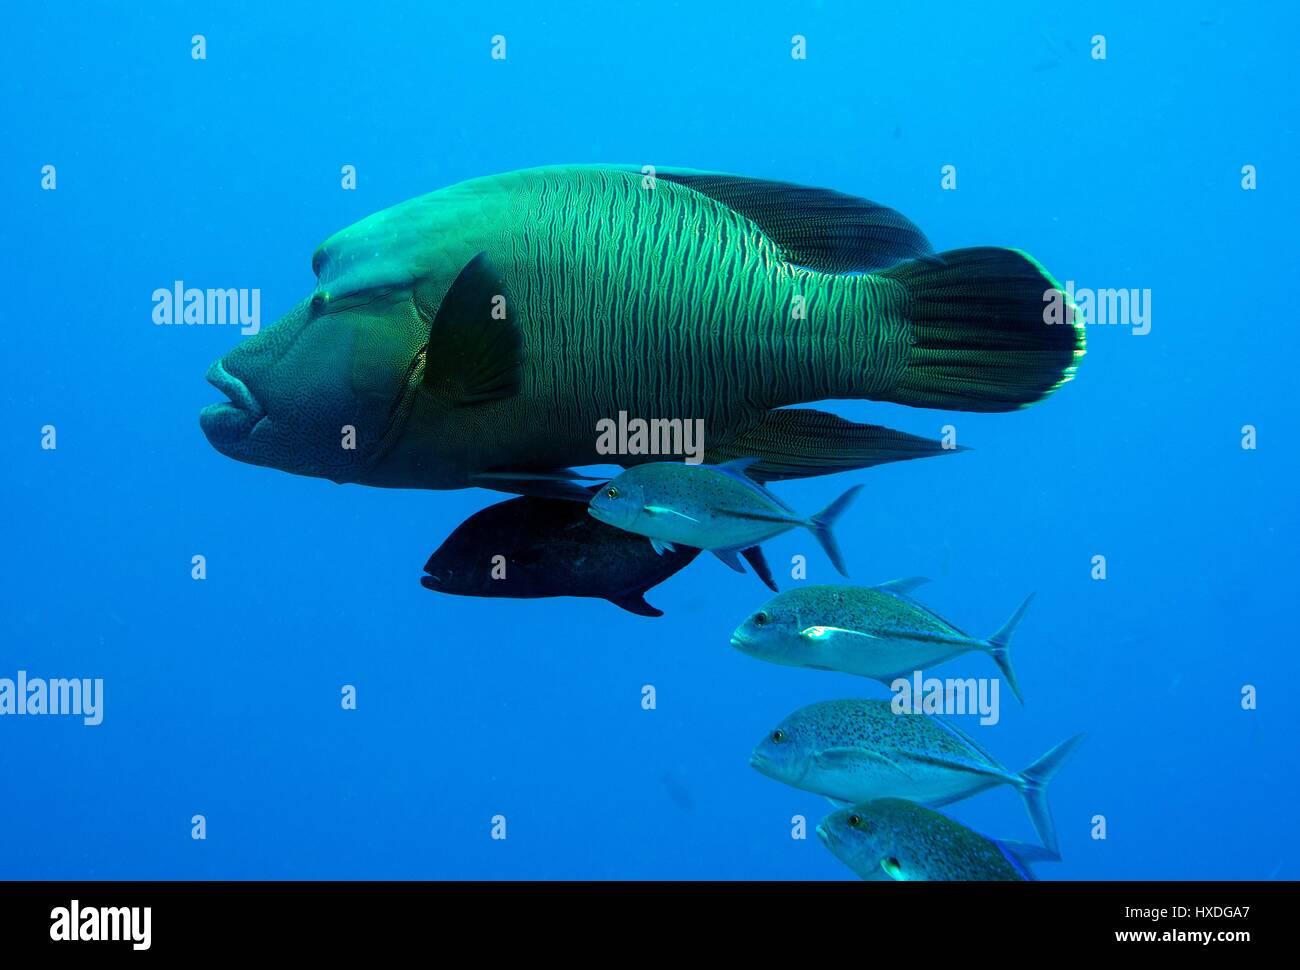 Napoleon wrasse and jackfish, Indo Pacific - Stock Image